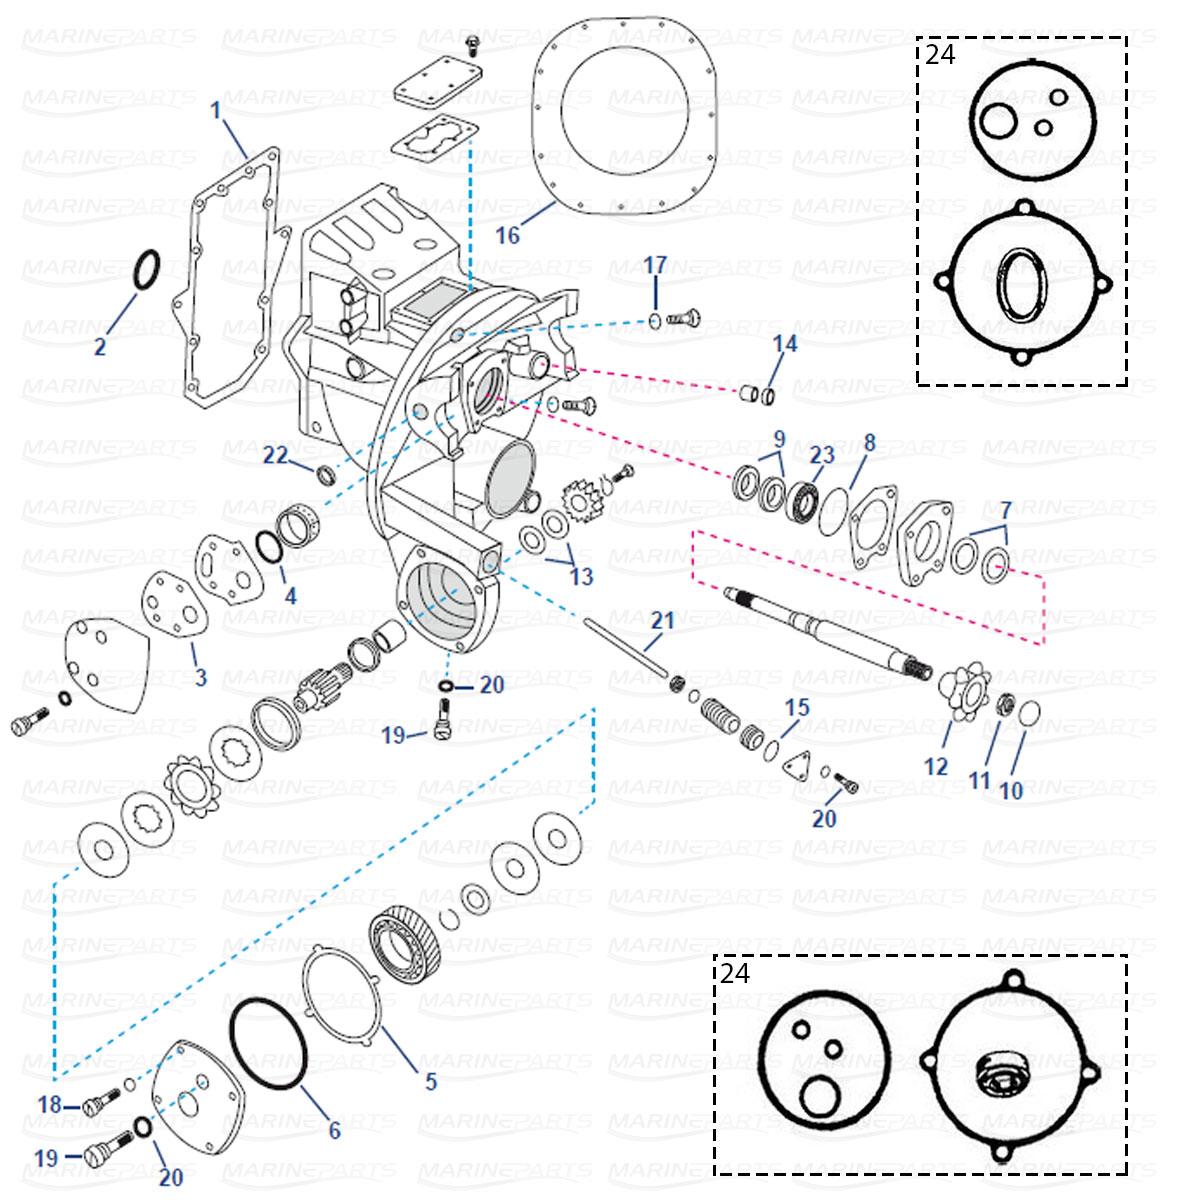 OMC Stringer 400-800 ahtripeegli varuosad